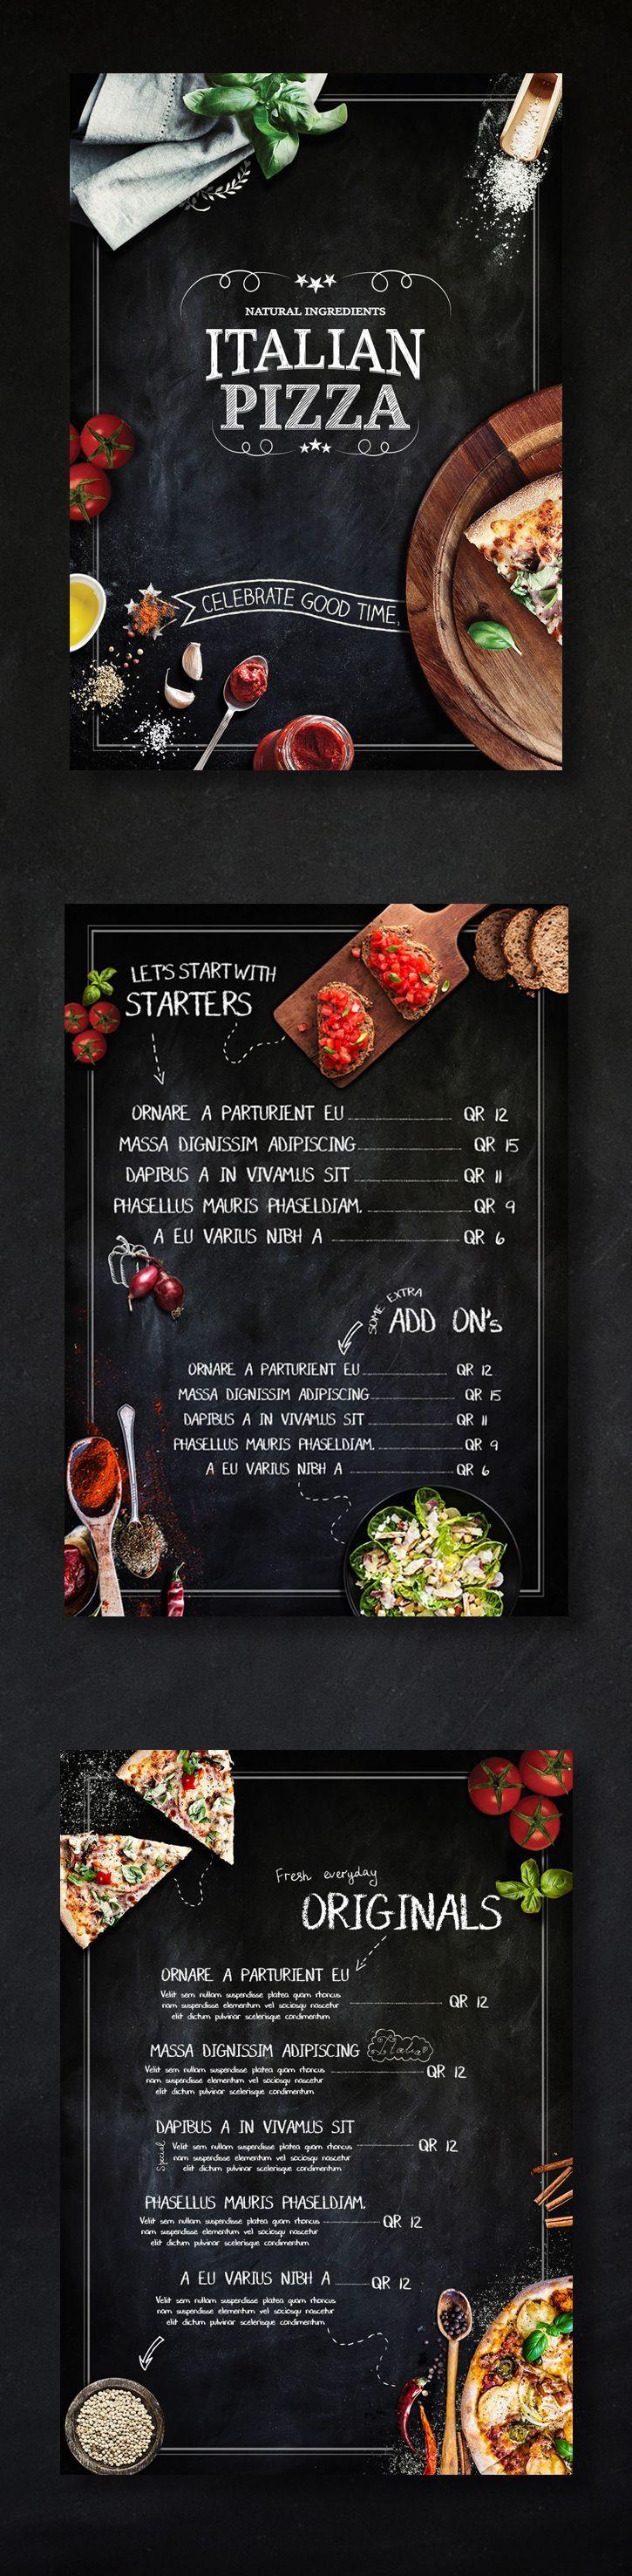 restaurant menu design inspiration design inspiration